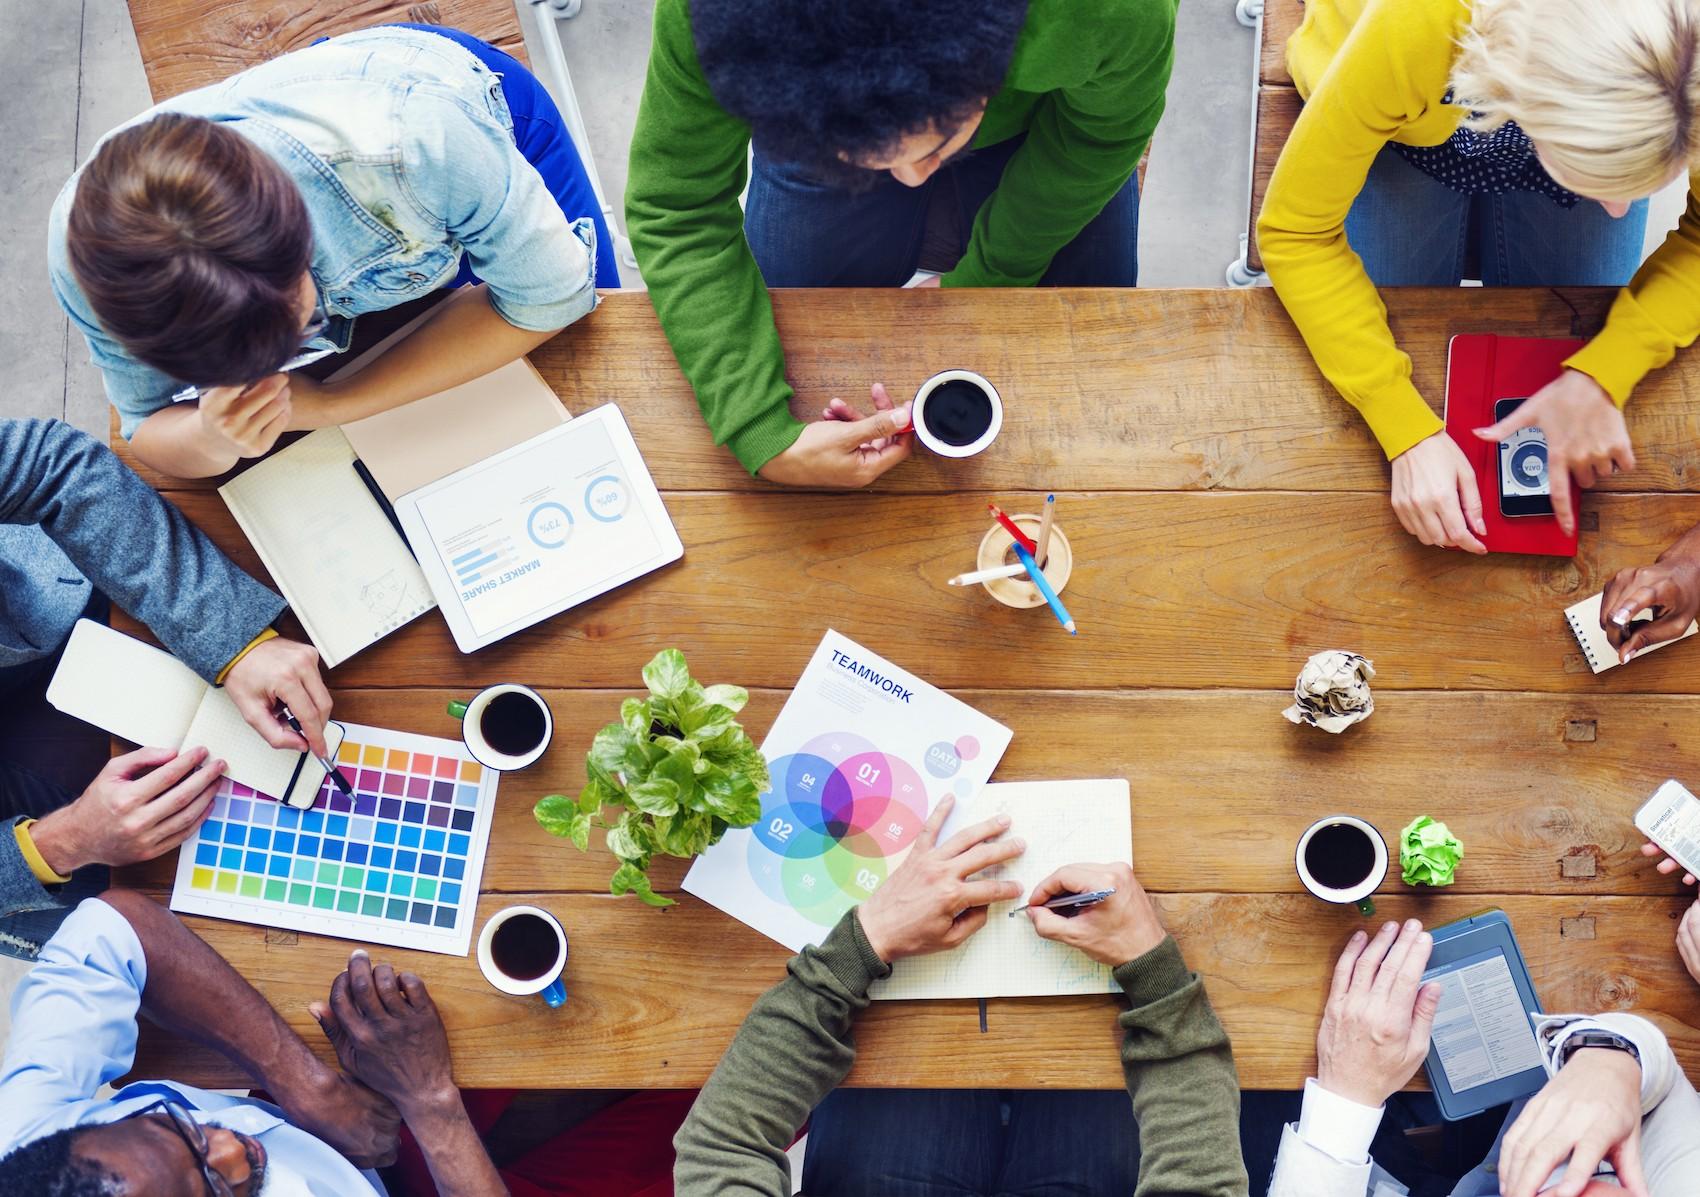 تمرکز روی محصول استارتاپ نه جذب سرمایه